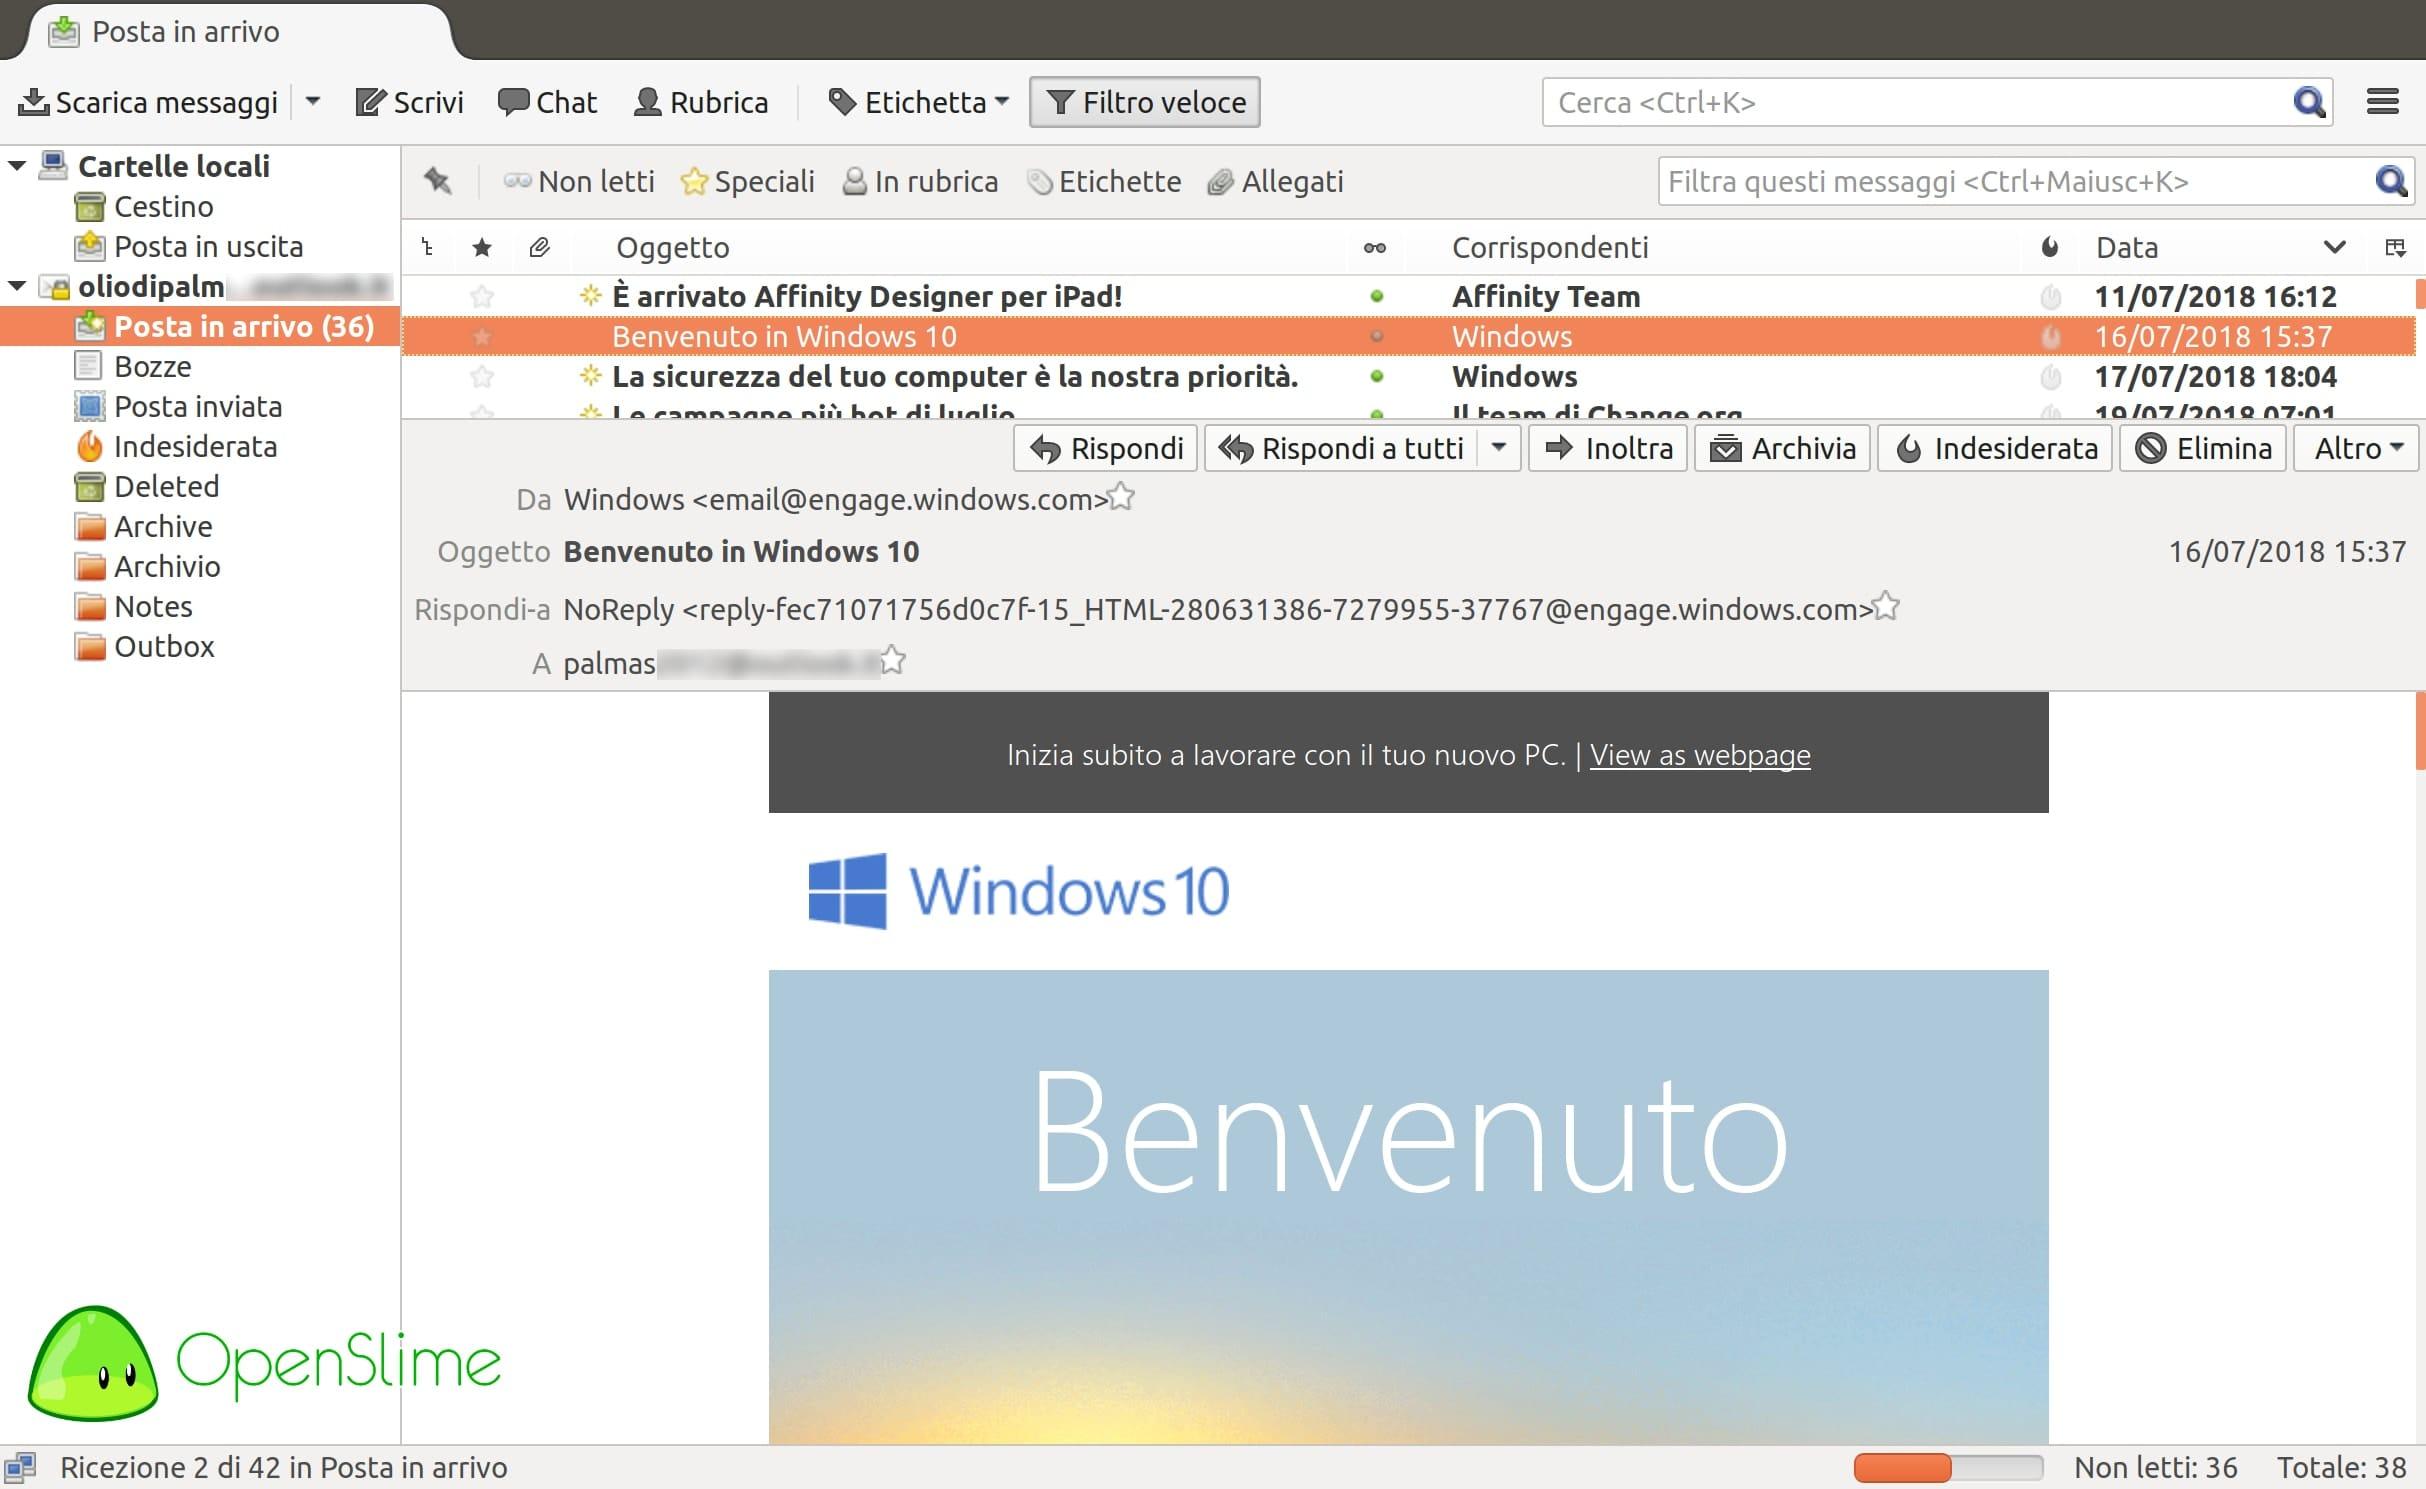 thunderbird - Recensione Ubuntu 18.04.1 LTS Bionic Beaver